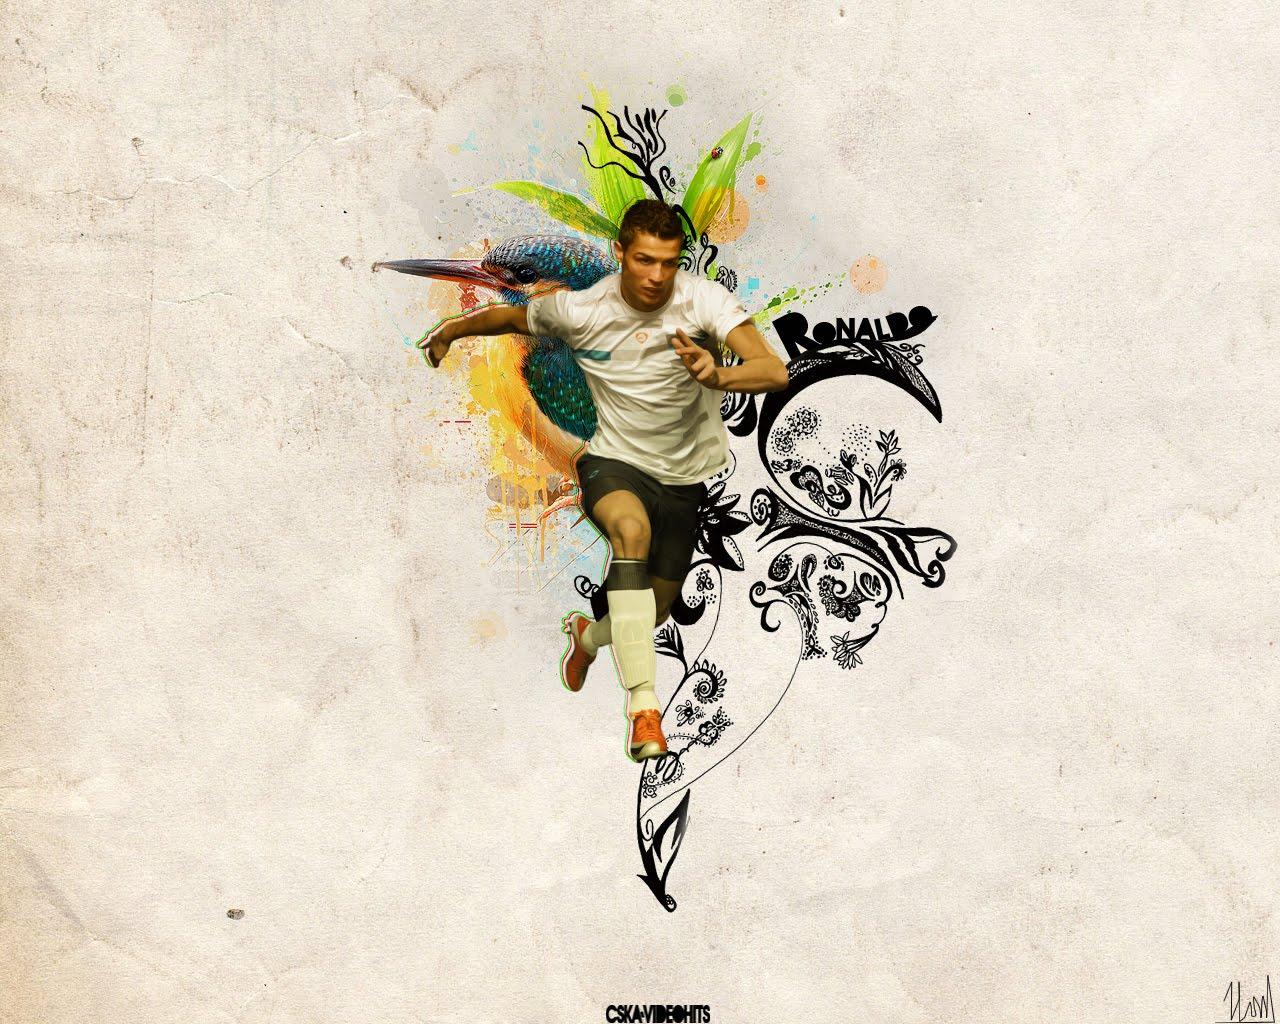 Football Wallpapers 23: Football Wallpapers&Football-Avatars: Wallpaper-C.Ronaldo